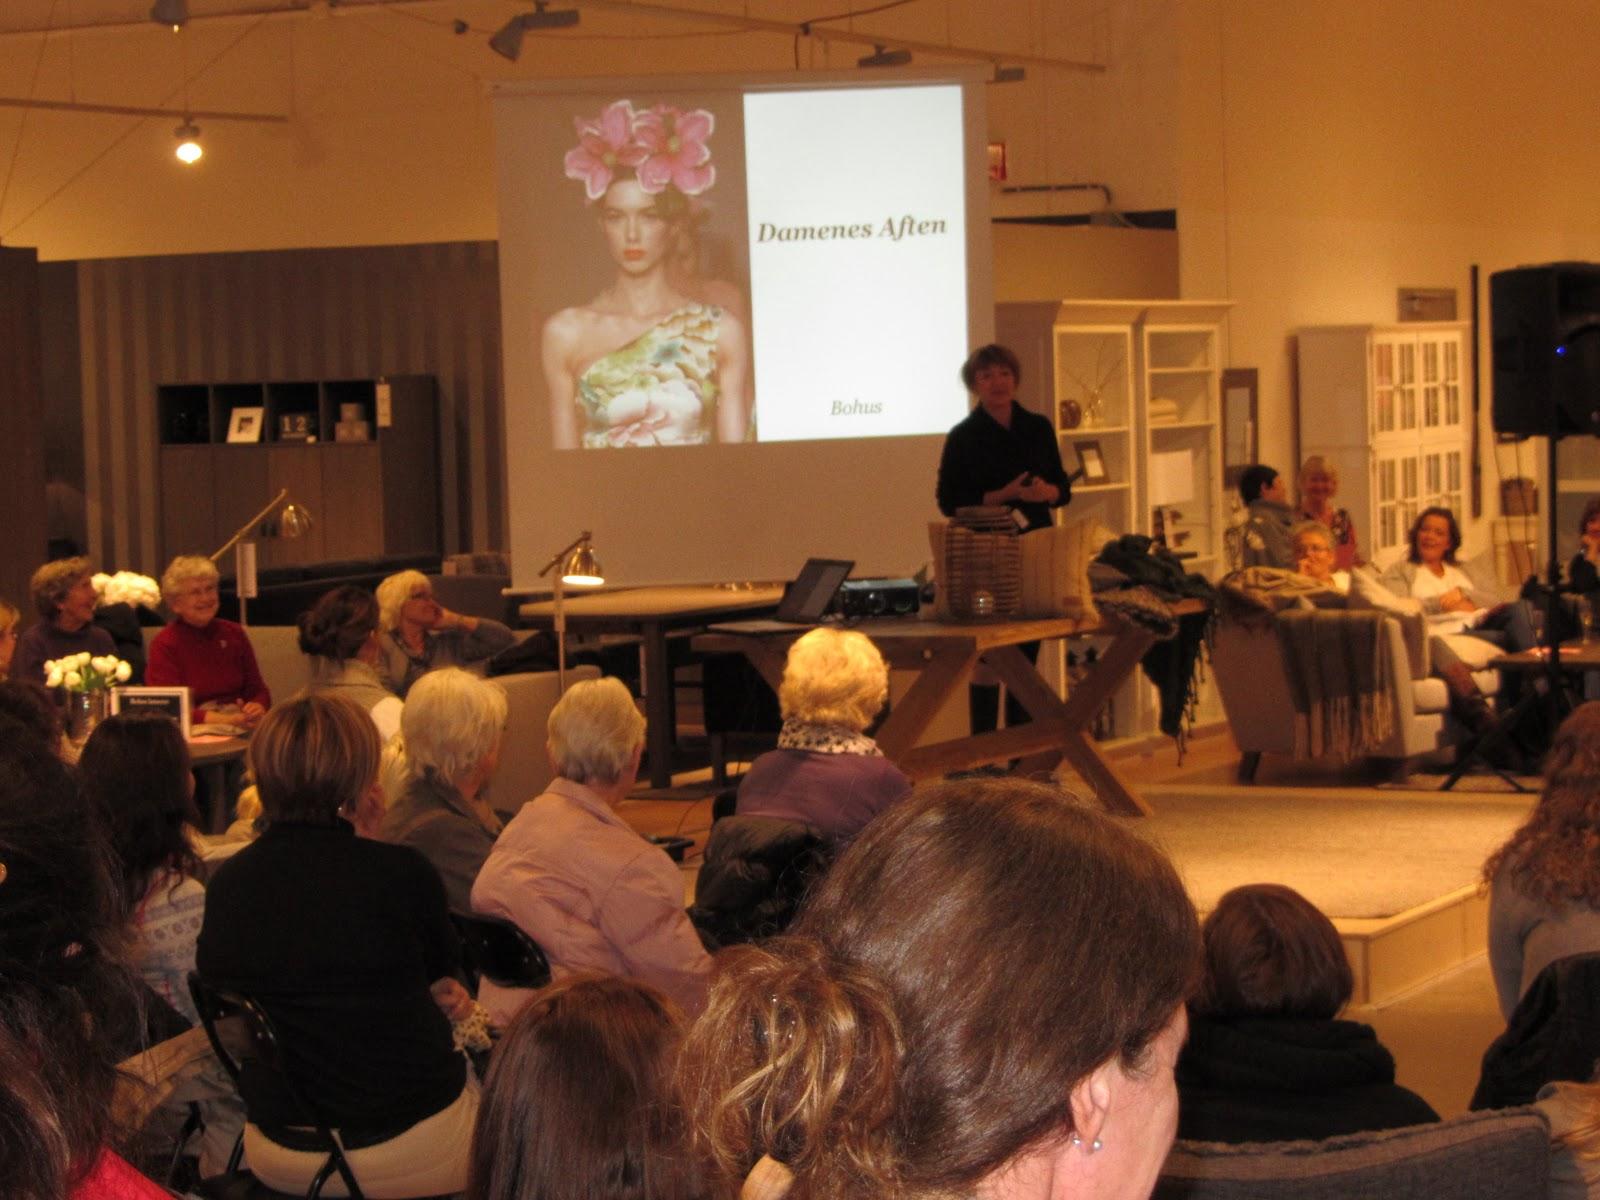 28 magnolia avenue: damenes aften på bohus design 6000